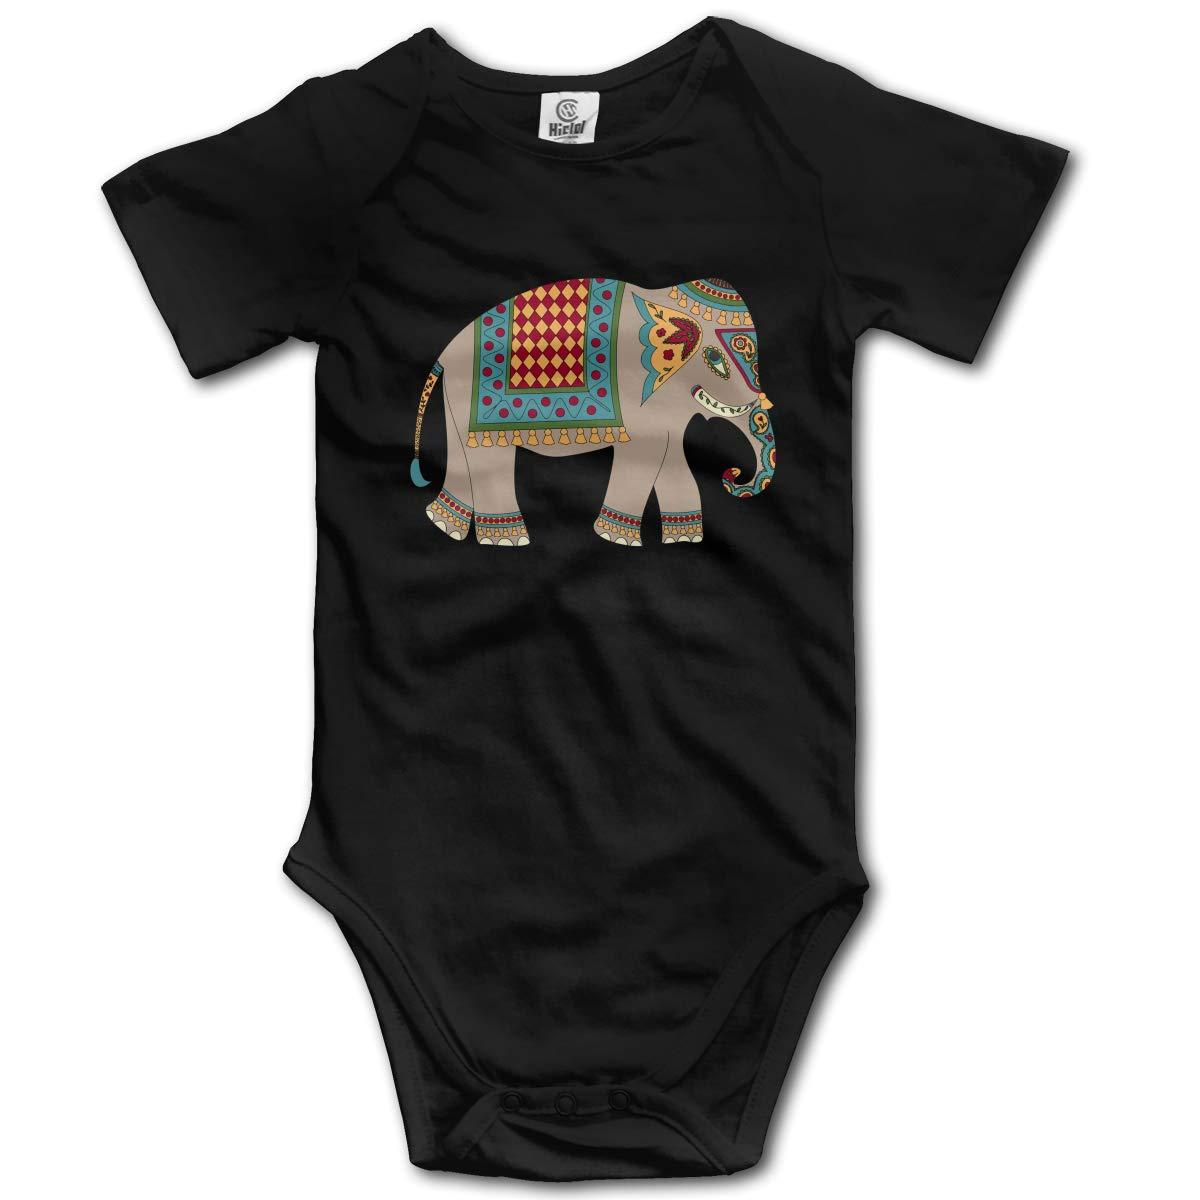 Elephant Clipart Thailand Unisex Solid Baby 100/% Organic Cotton Romper Bodysuit Tops 0-2T